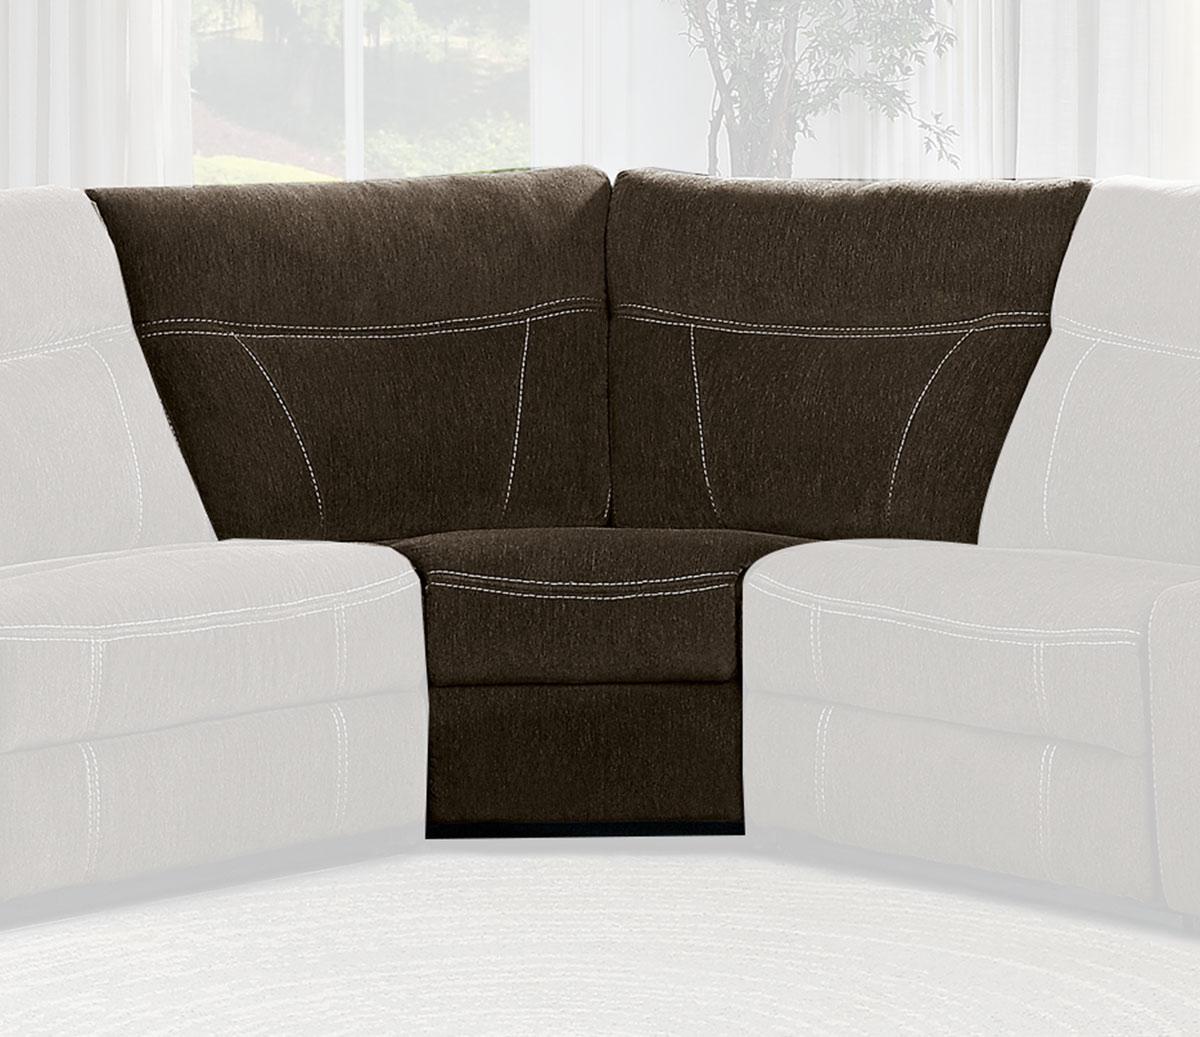 Homelegance Annabelle Corner Seat - Brown